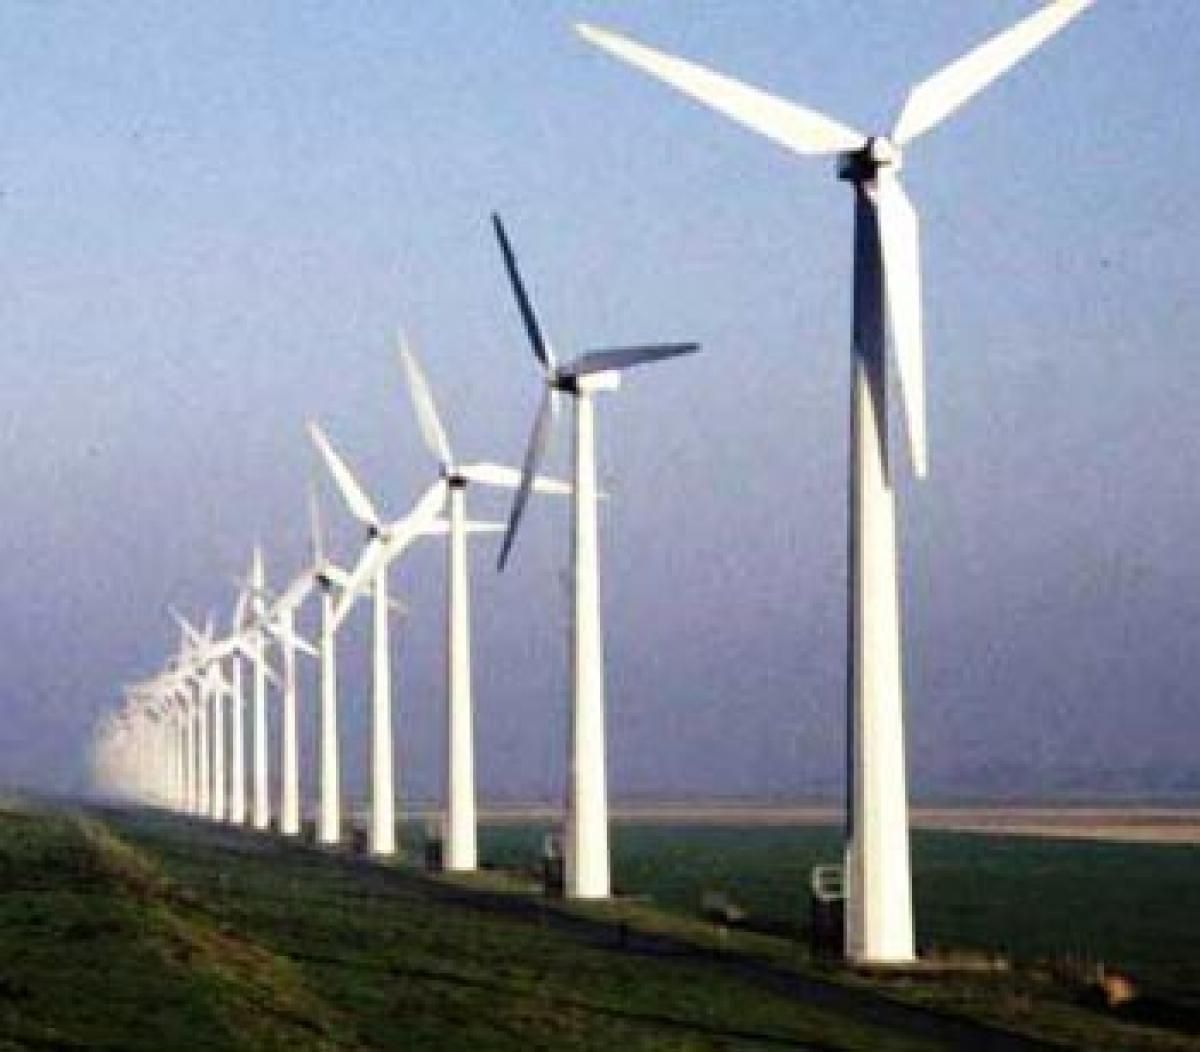 Wind turbine firms seek more tariff in TS